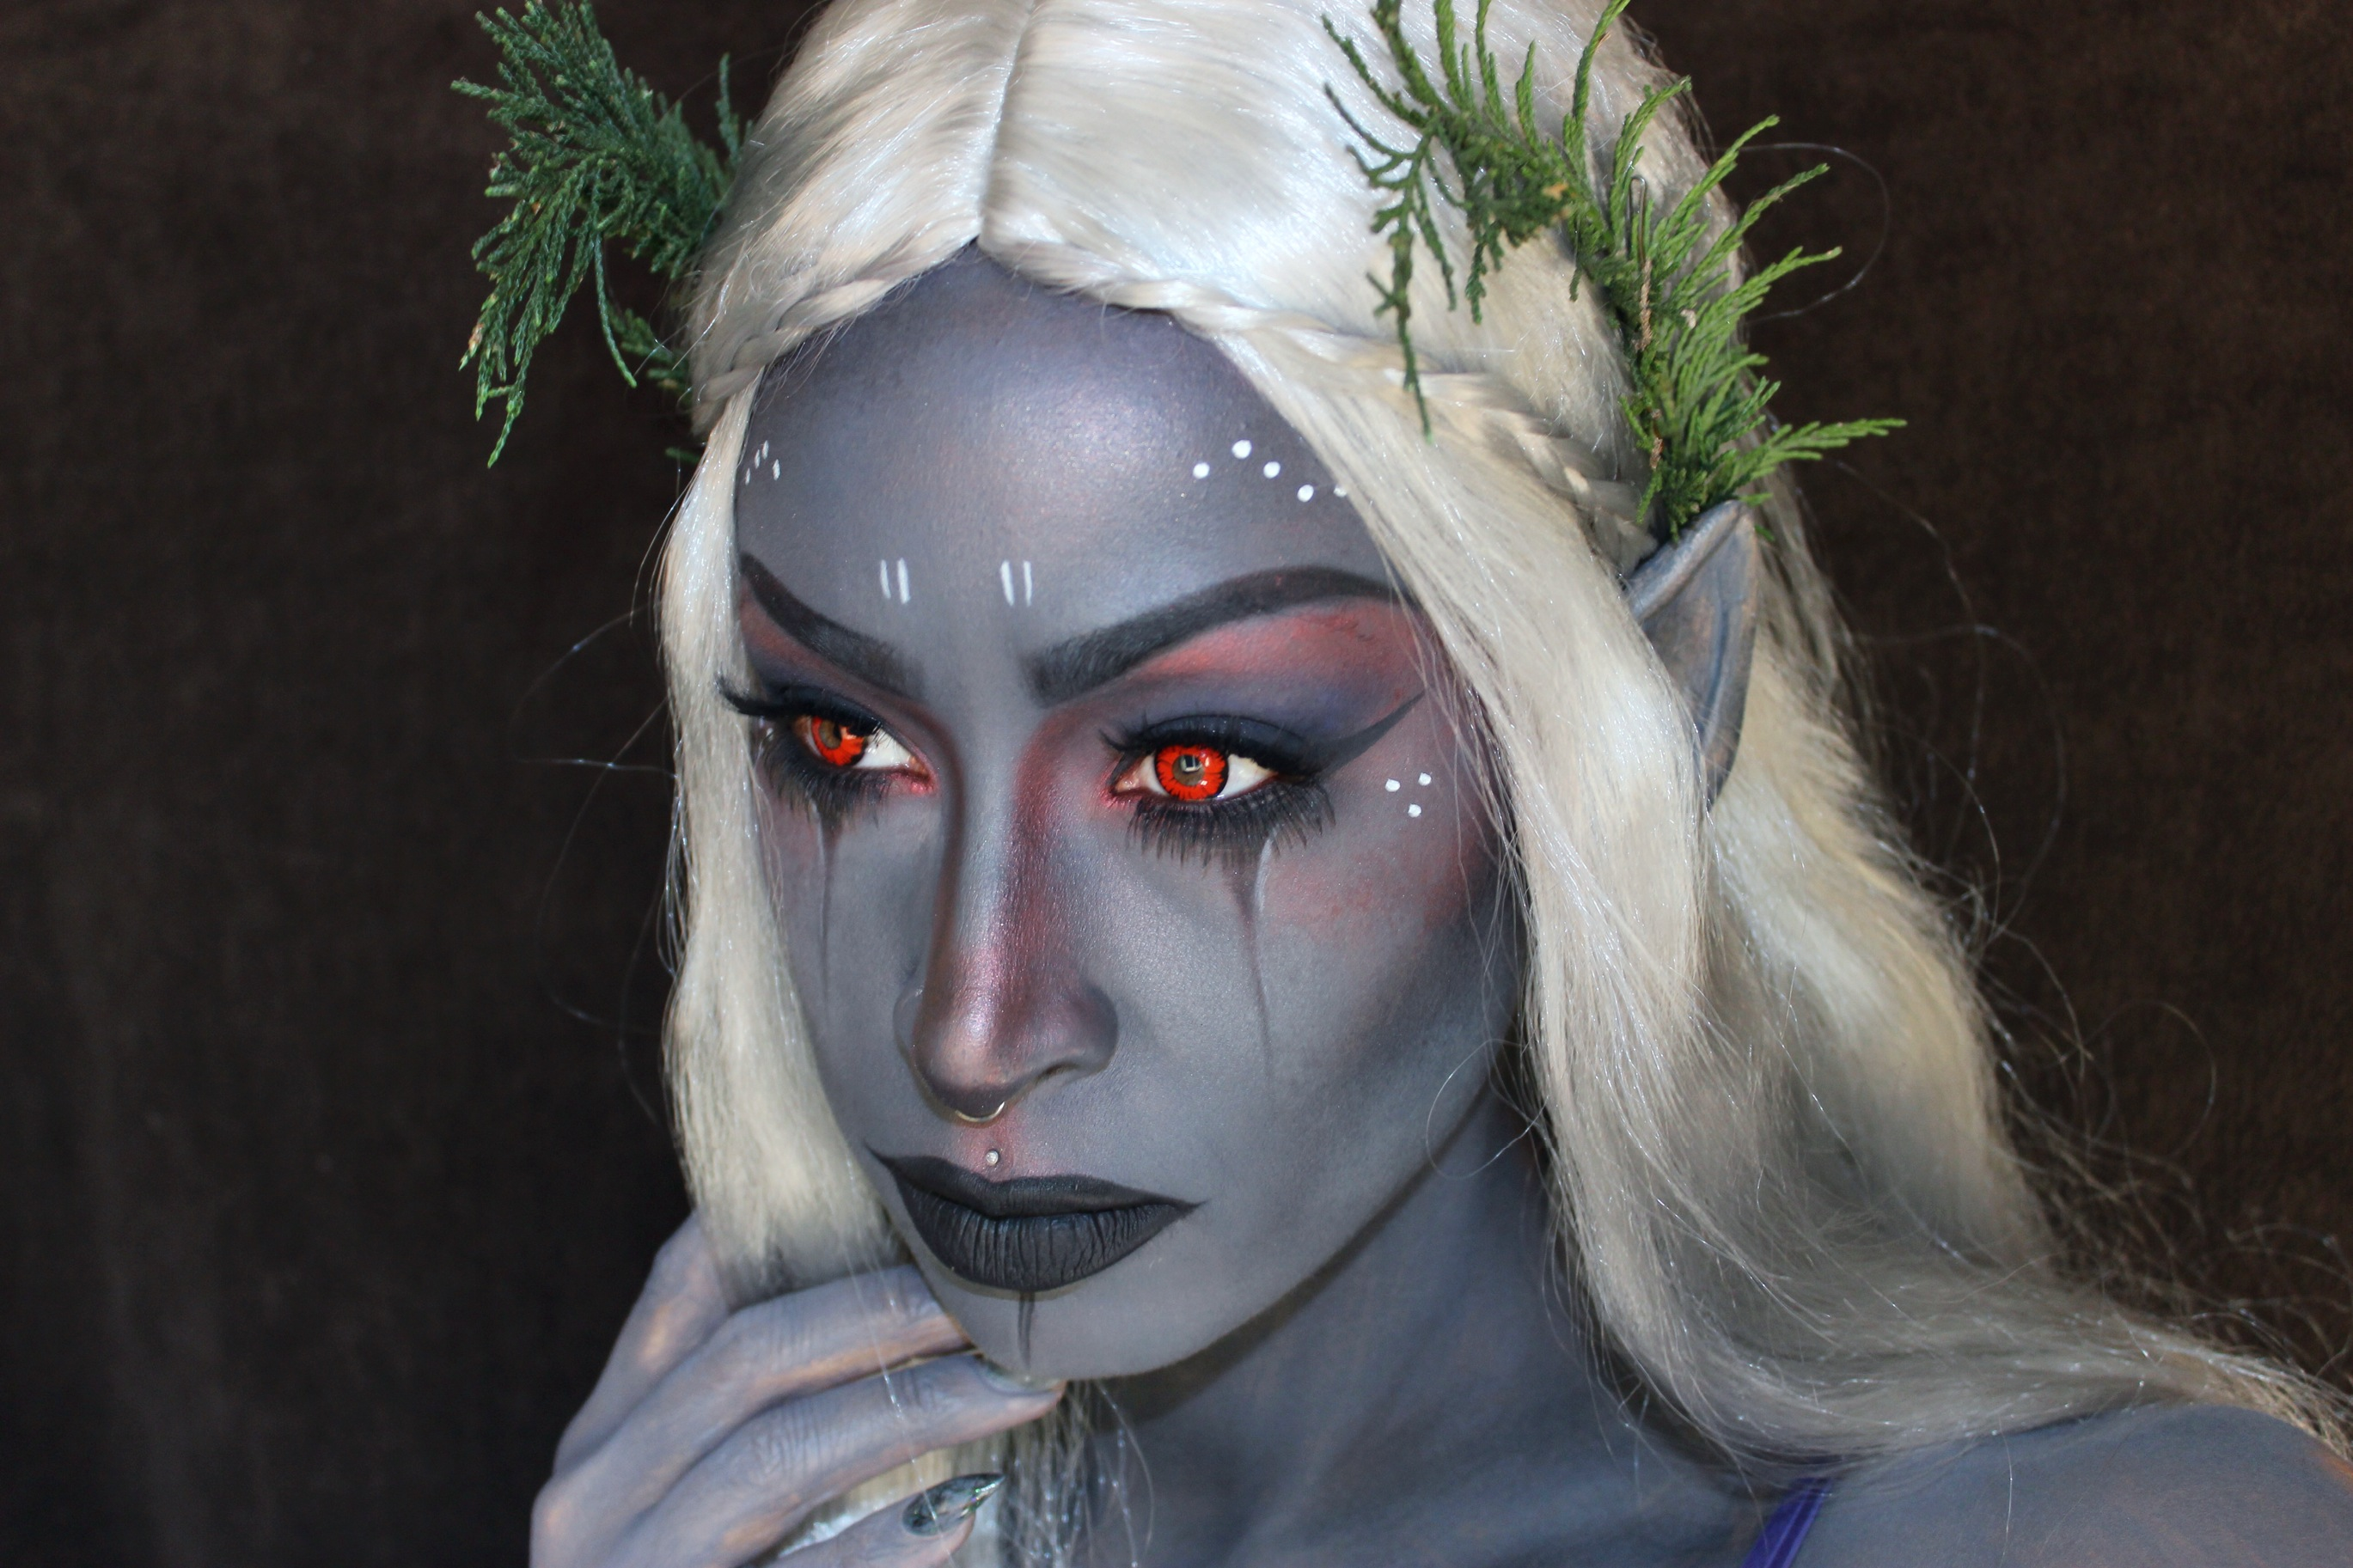 dark-elf-cosplay  sc 1 st  Geek Native & Dark Elf cosplay